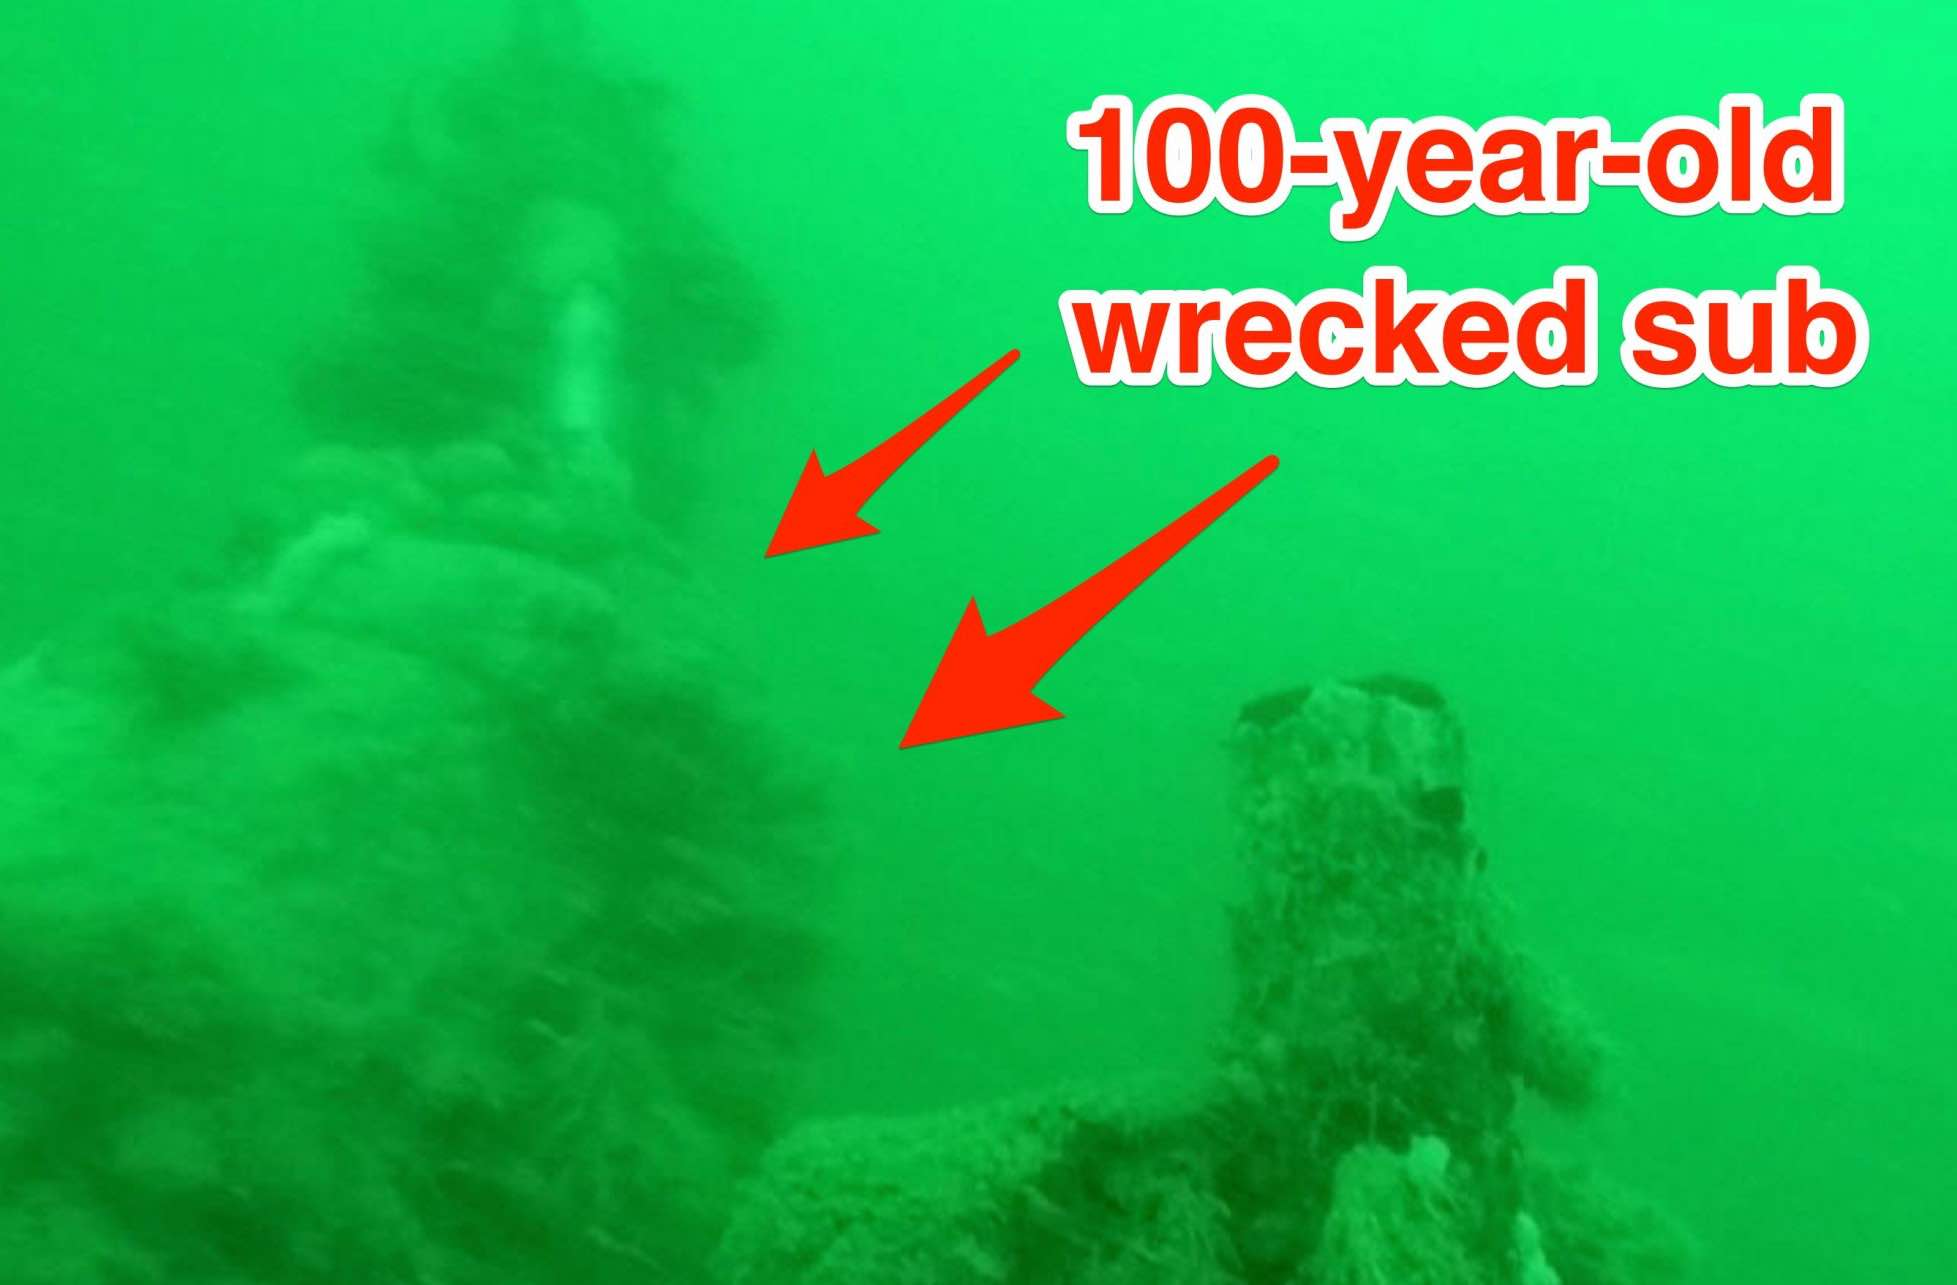 Wreck Of WW1 U-boat Found Off Belgium (Video)